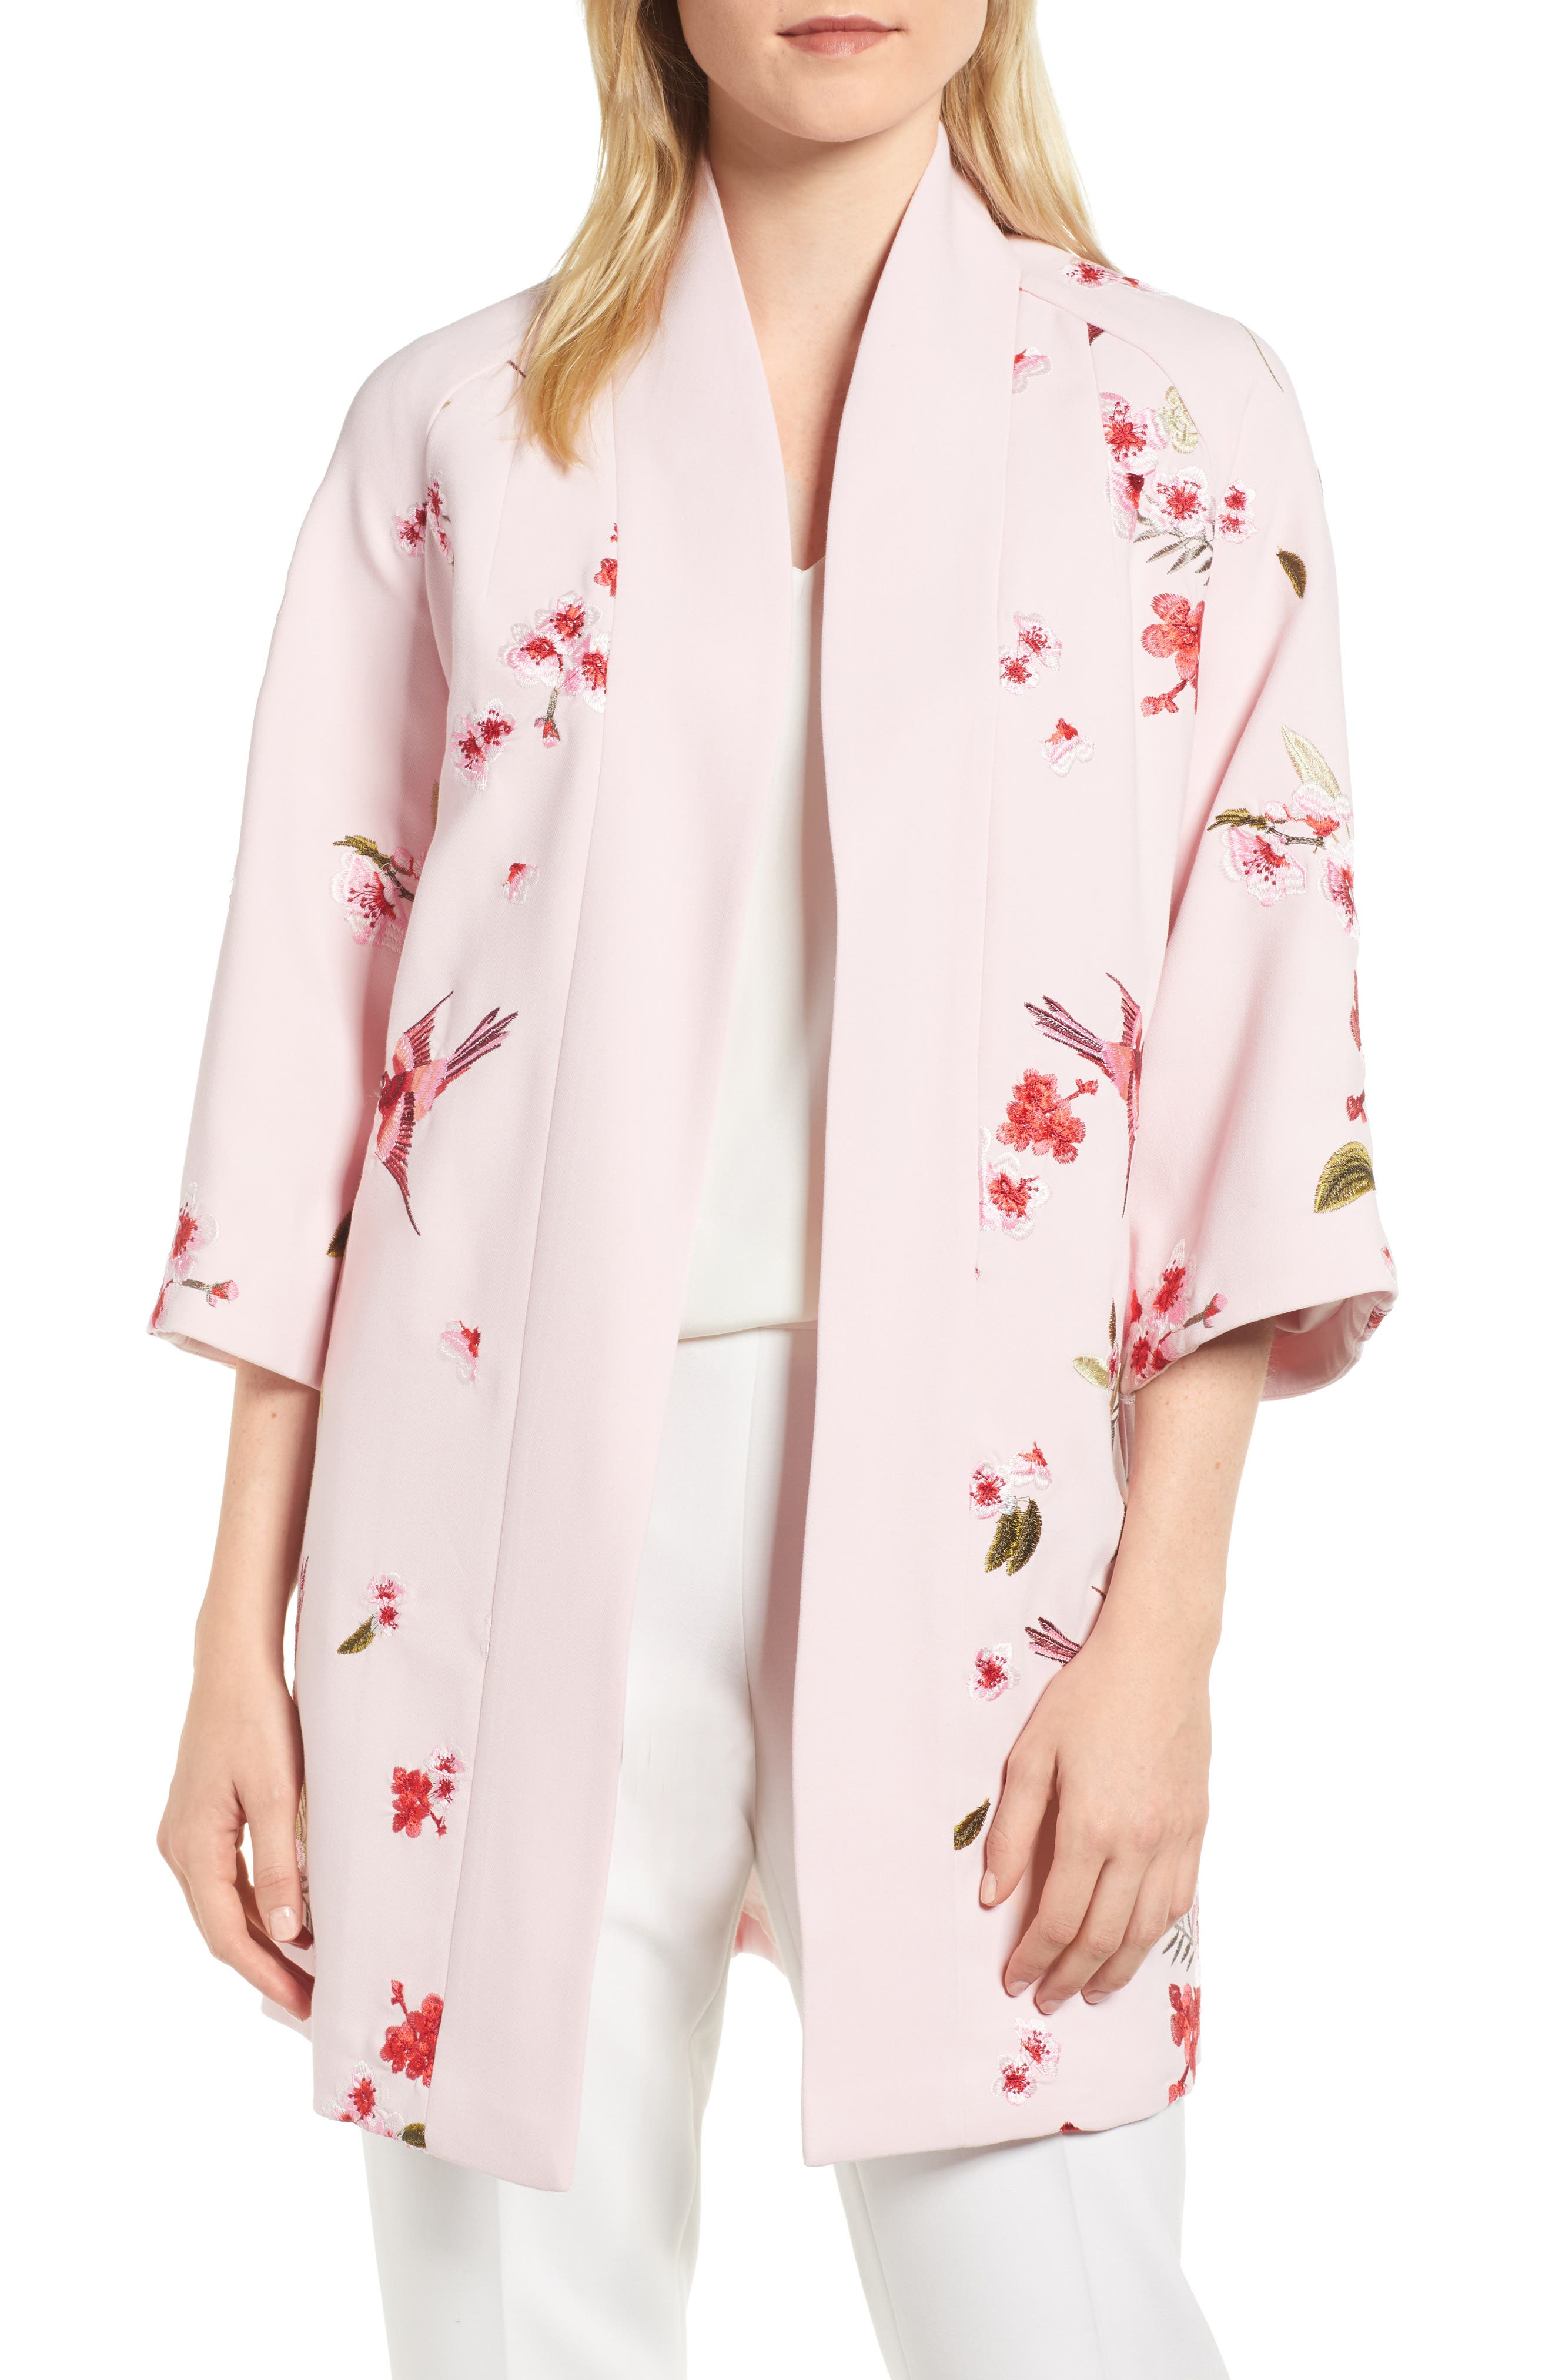 Bird & Blossom Spring Kimono,                             Main thumbnail 1, color,                             Baby Pink